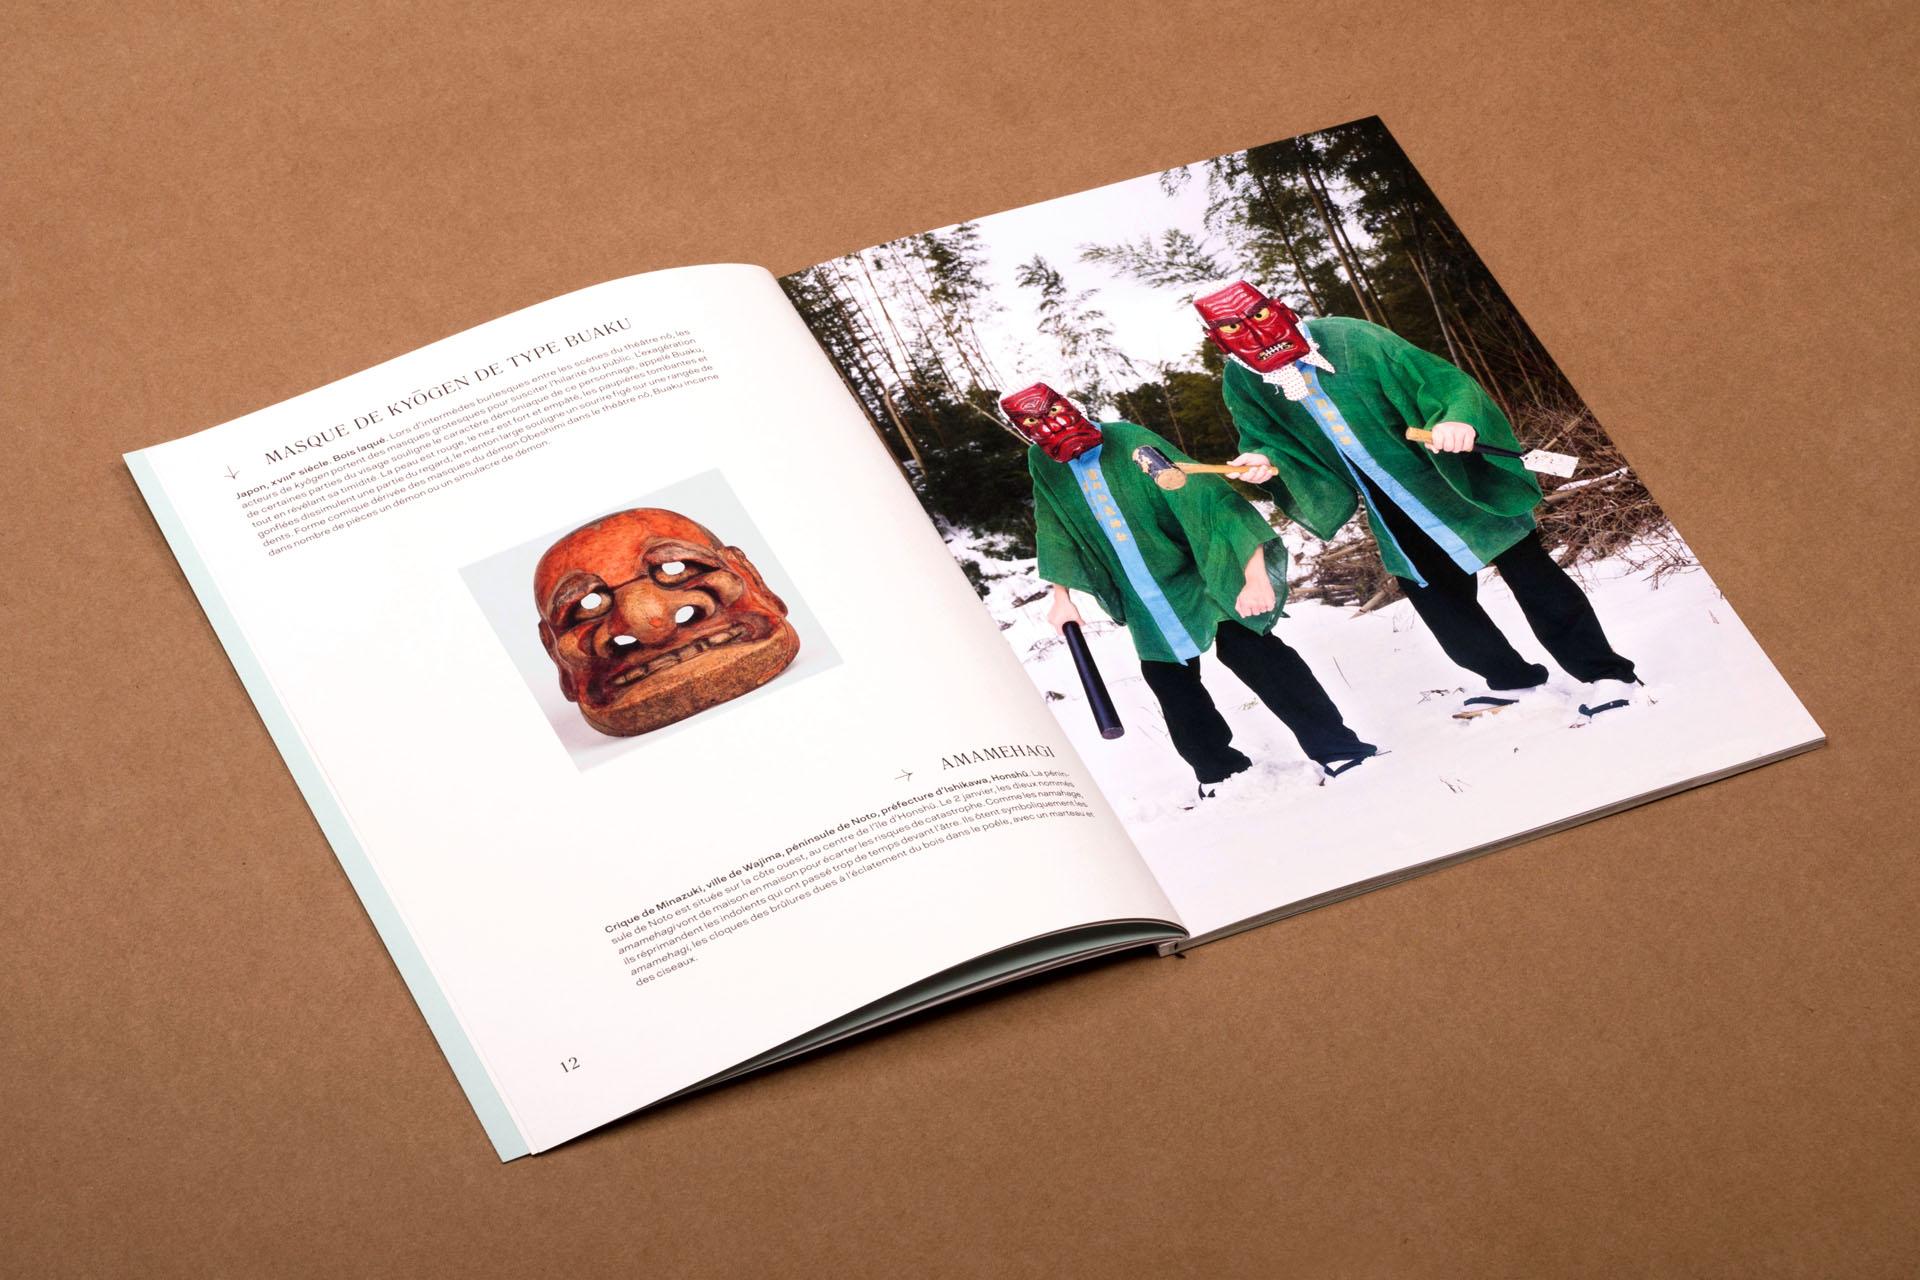 esprits-du-japon-charles-freger-catalogue-plastac